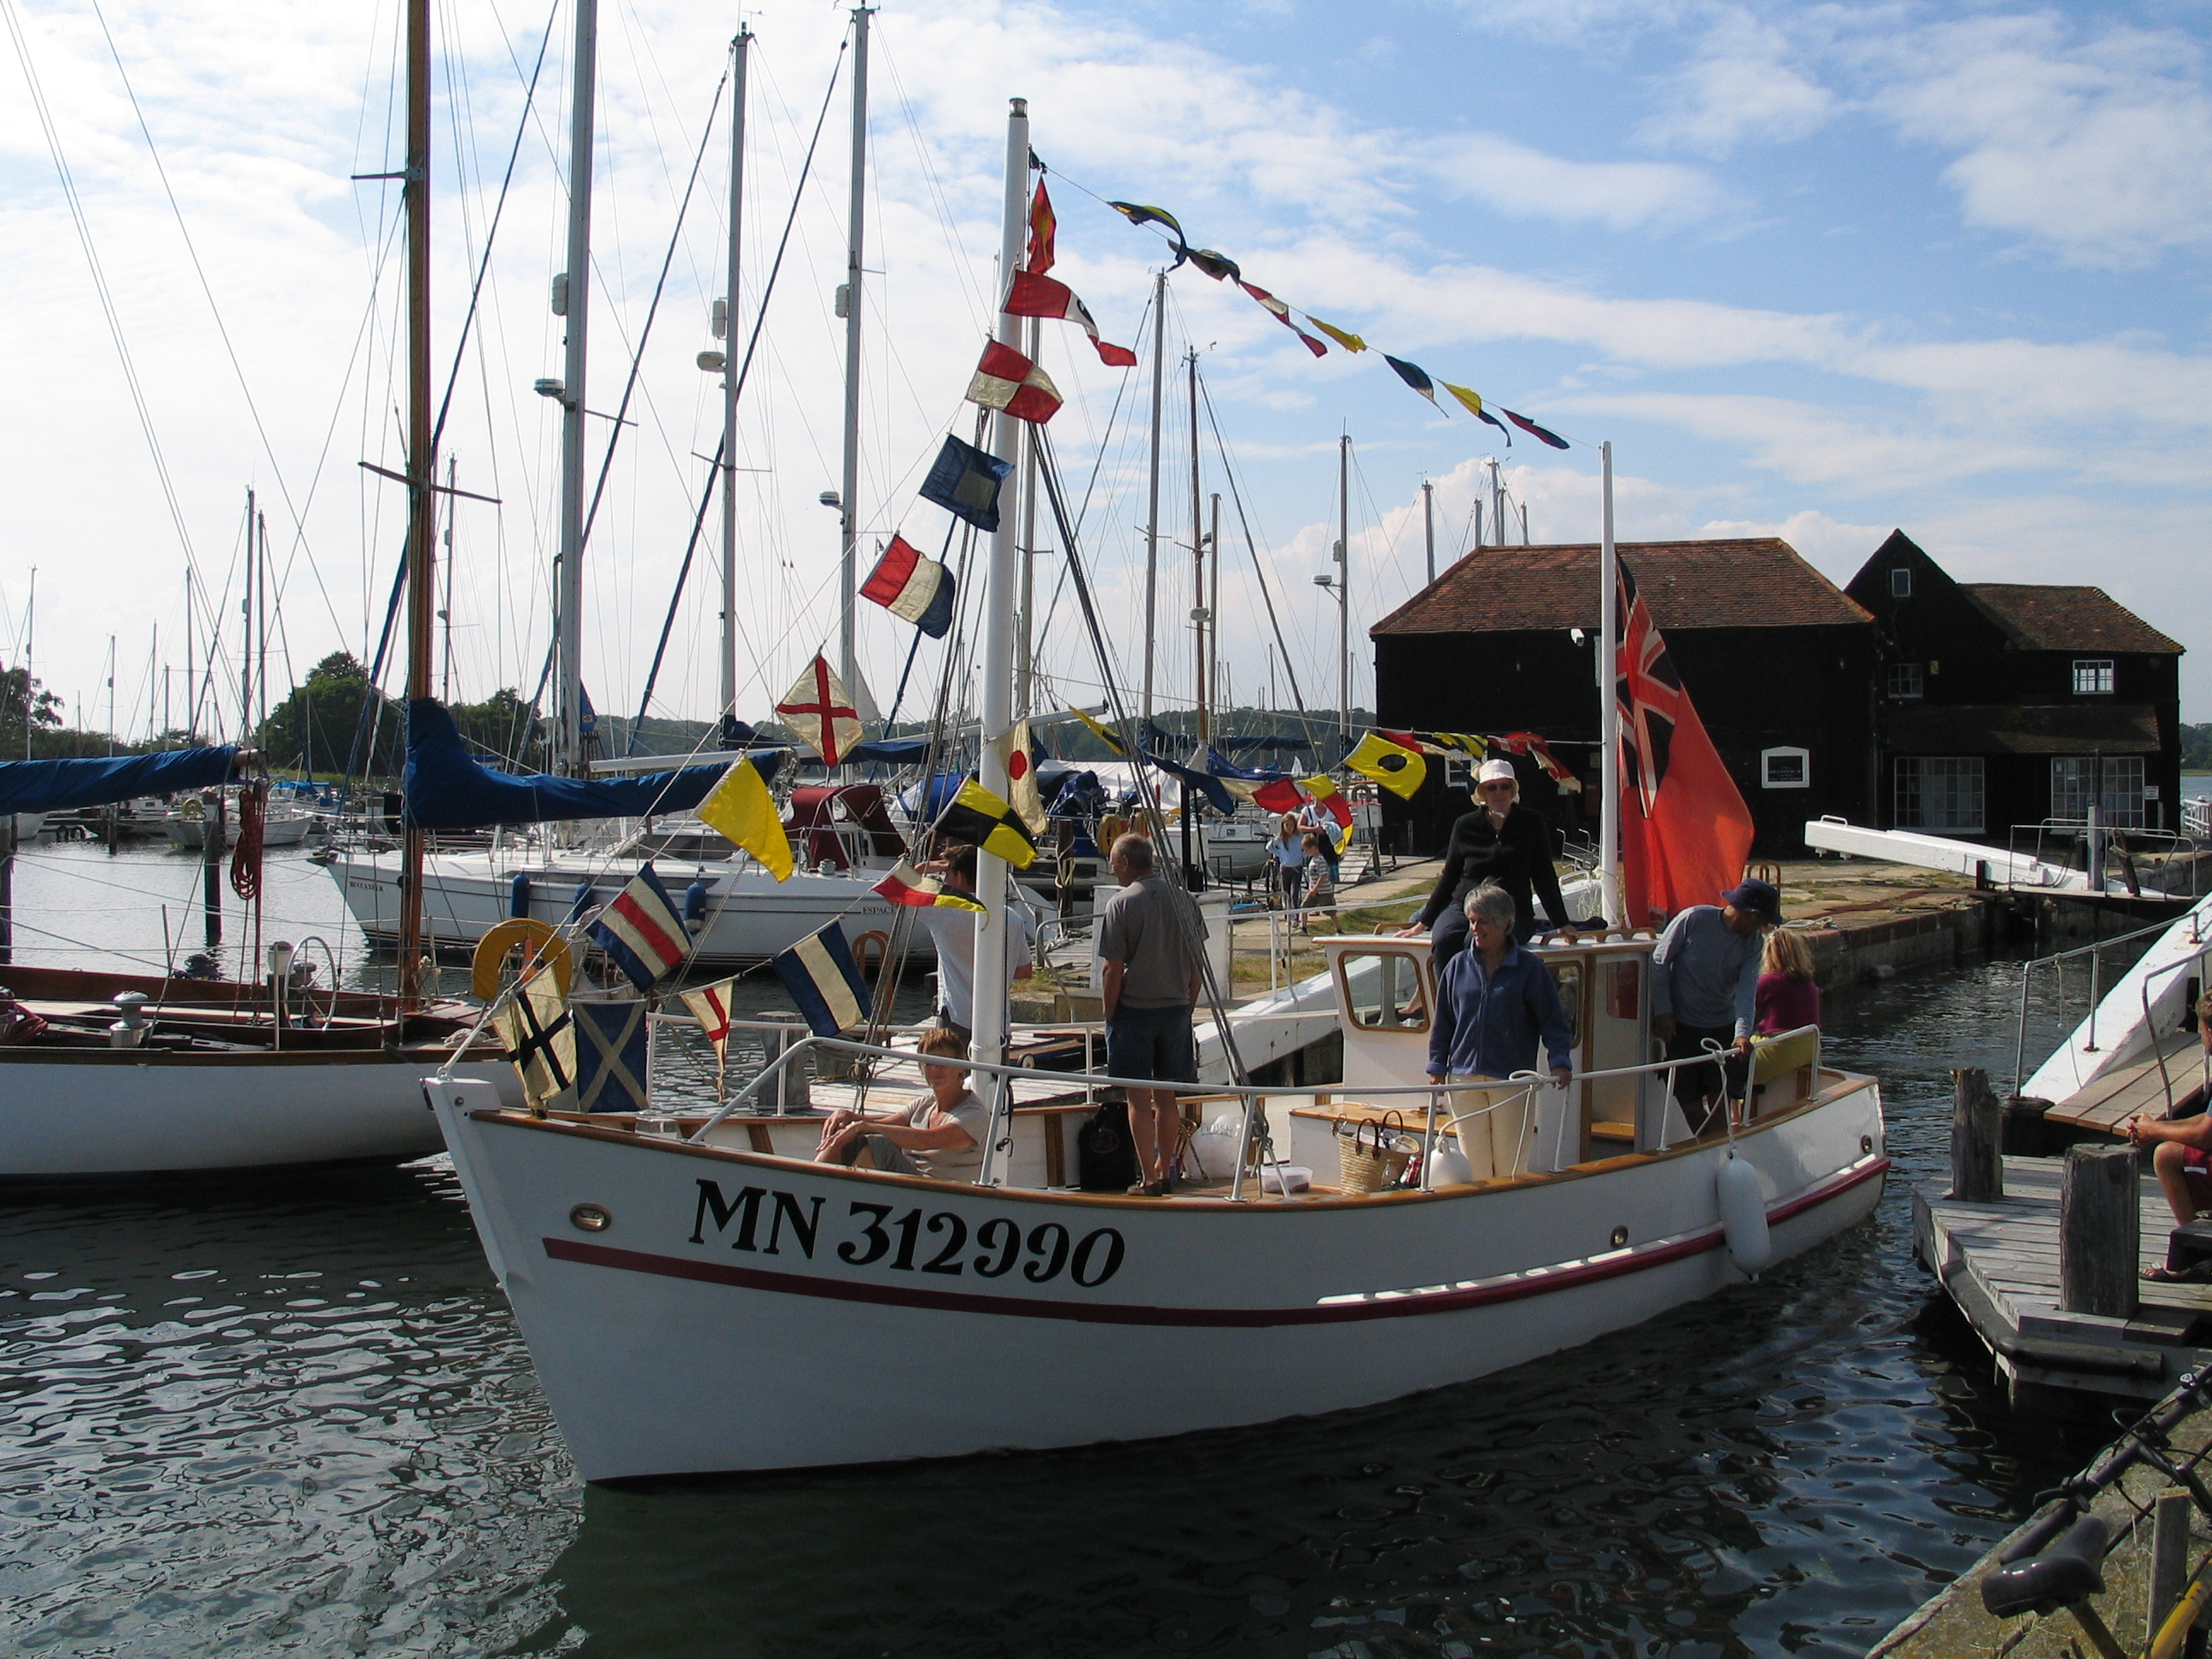 Boatyard Bac a Moteur